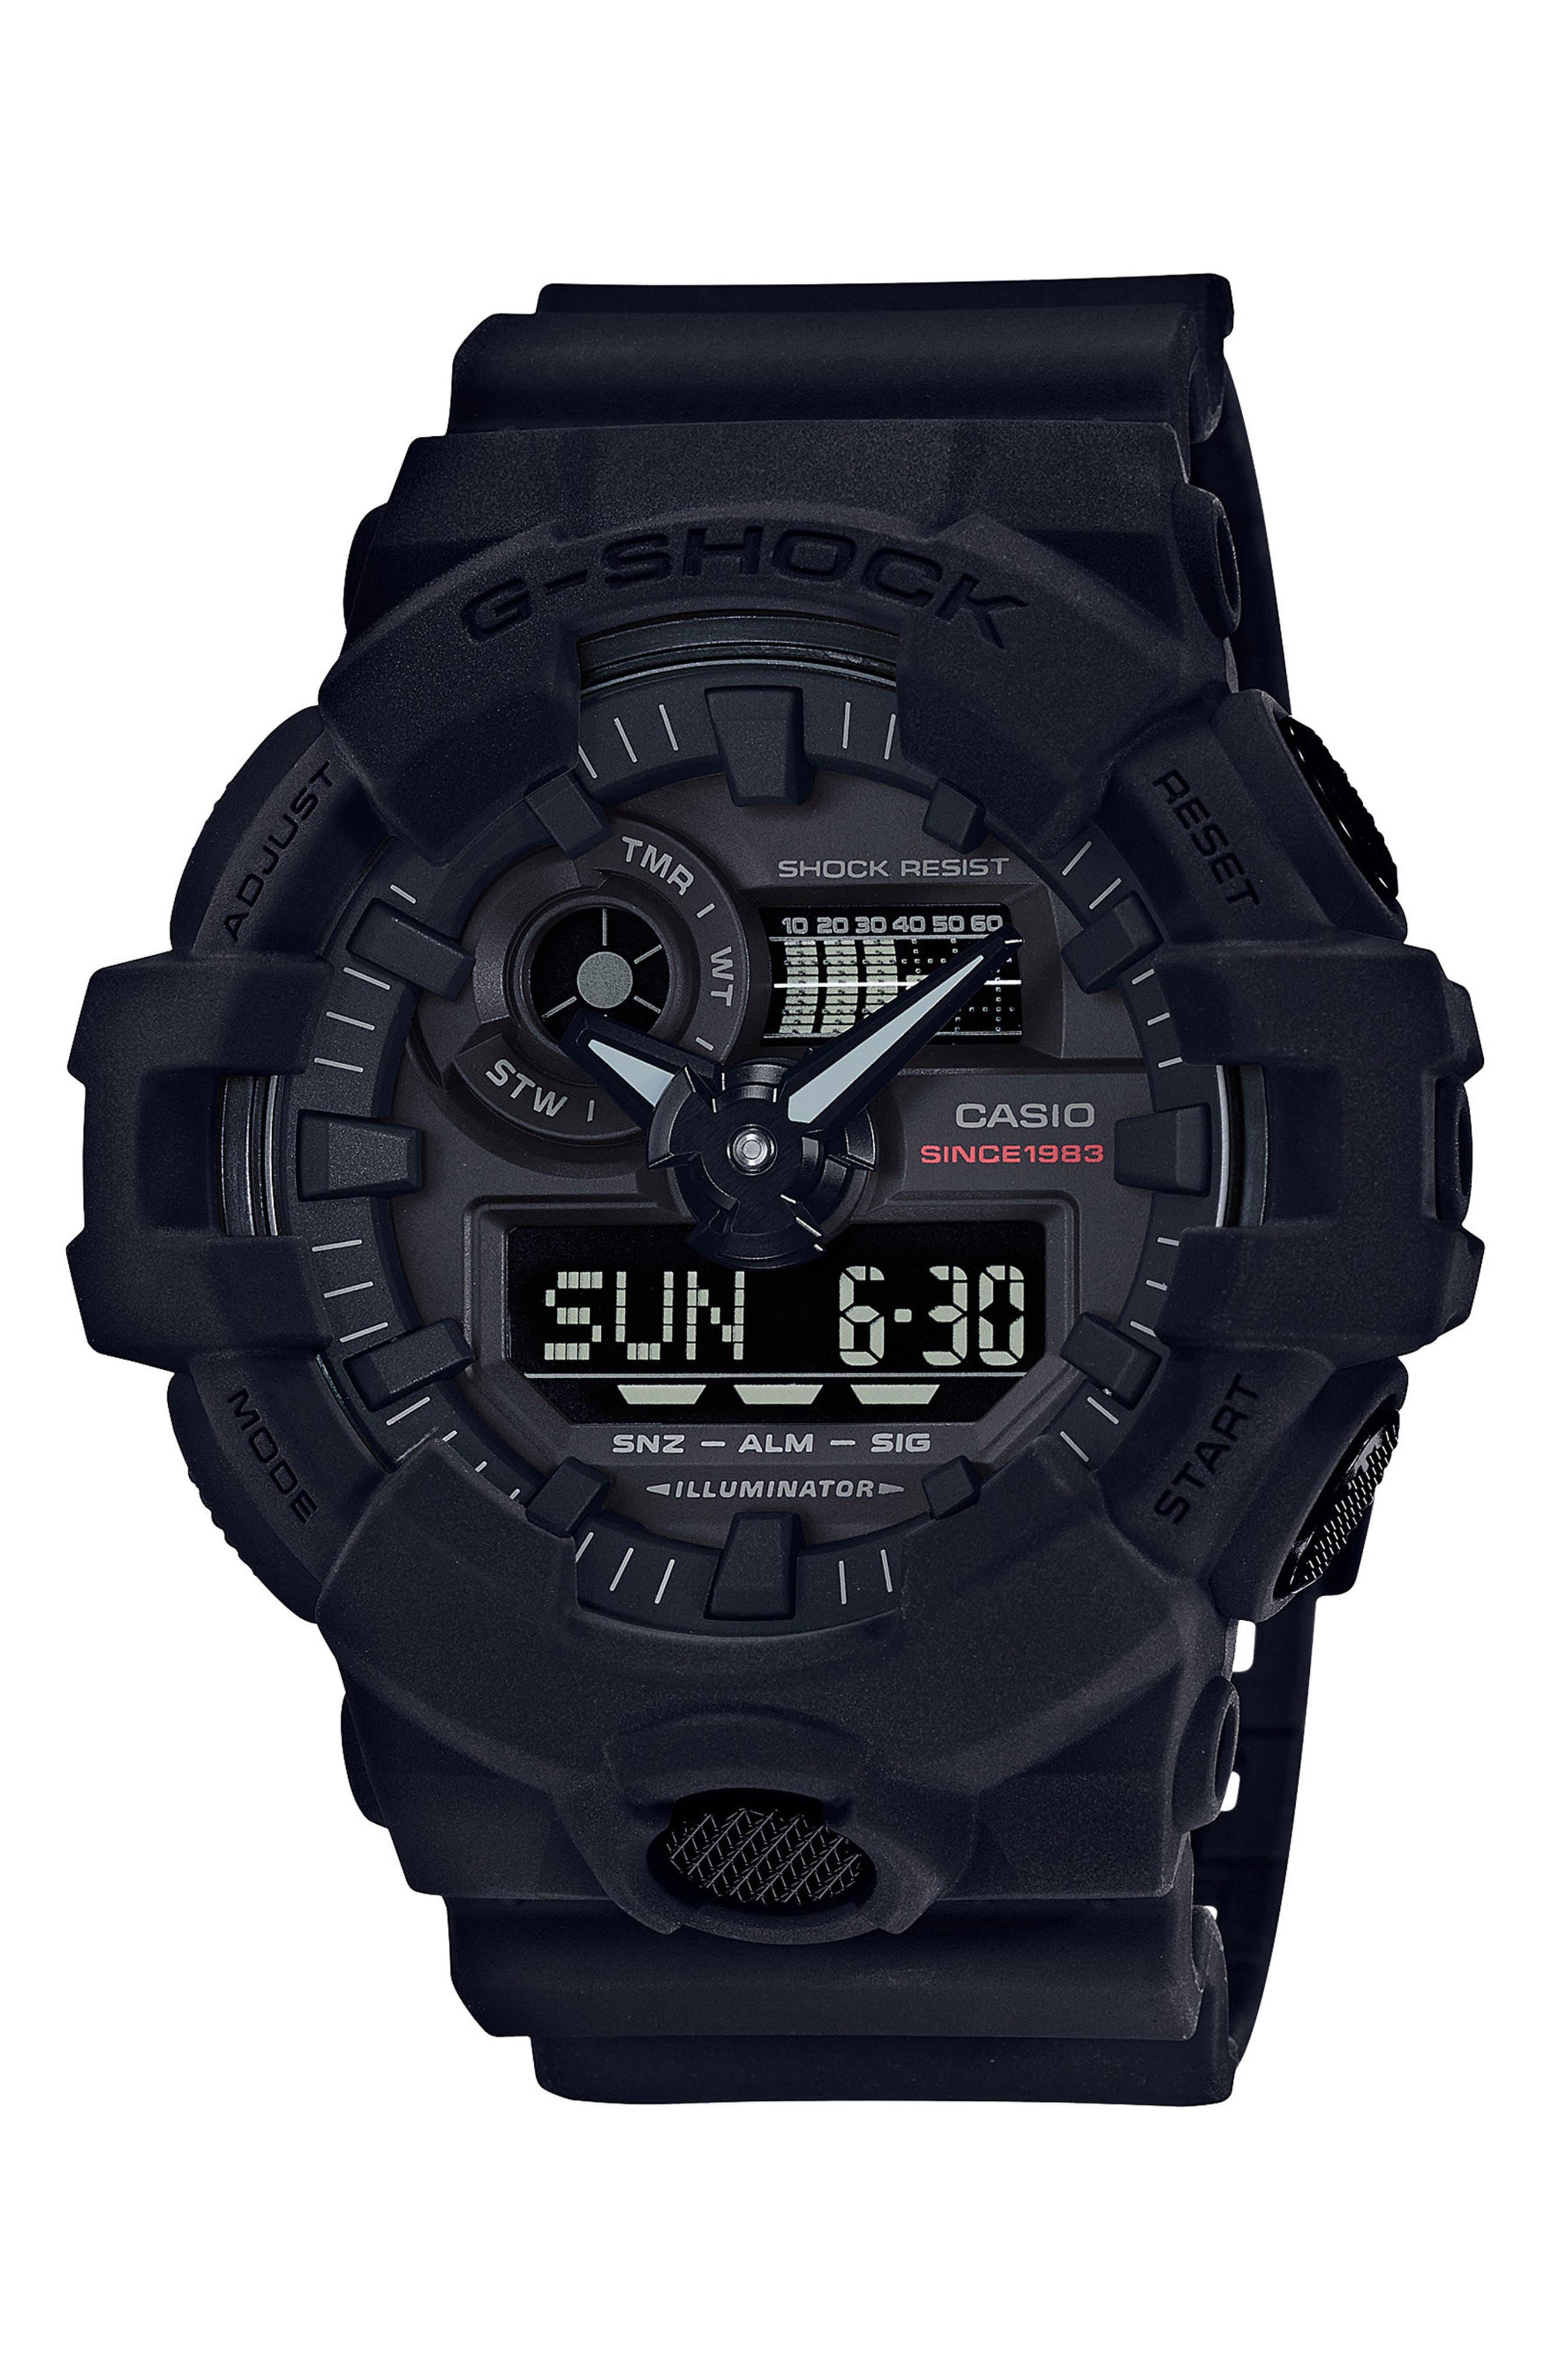 G-Shock Baby-G Neo Matte Black Resin Watch, 53.4mm